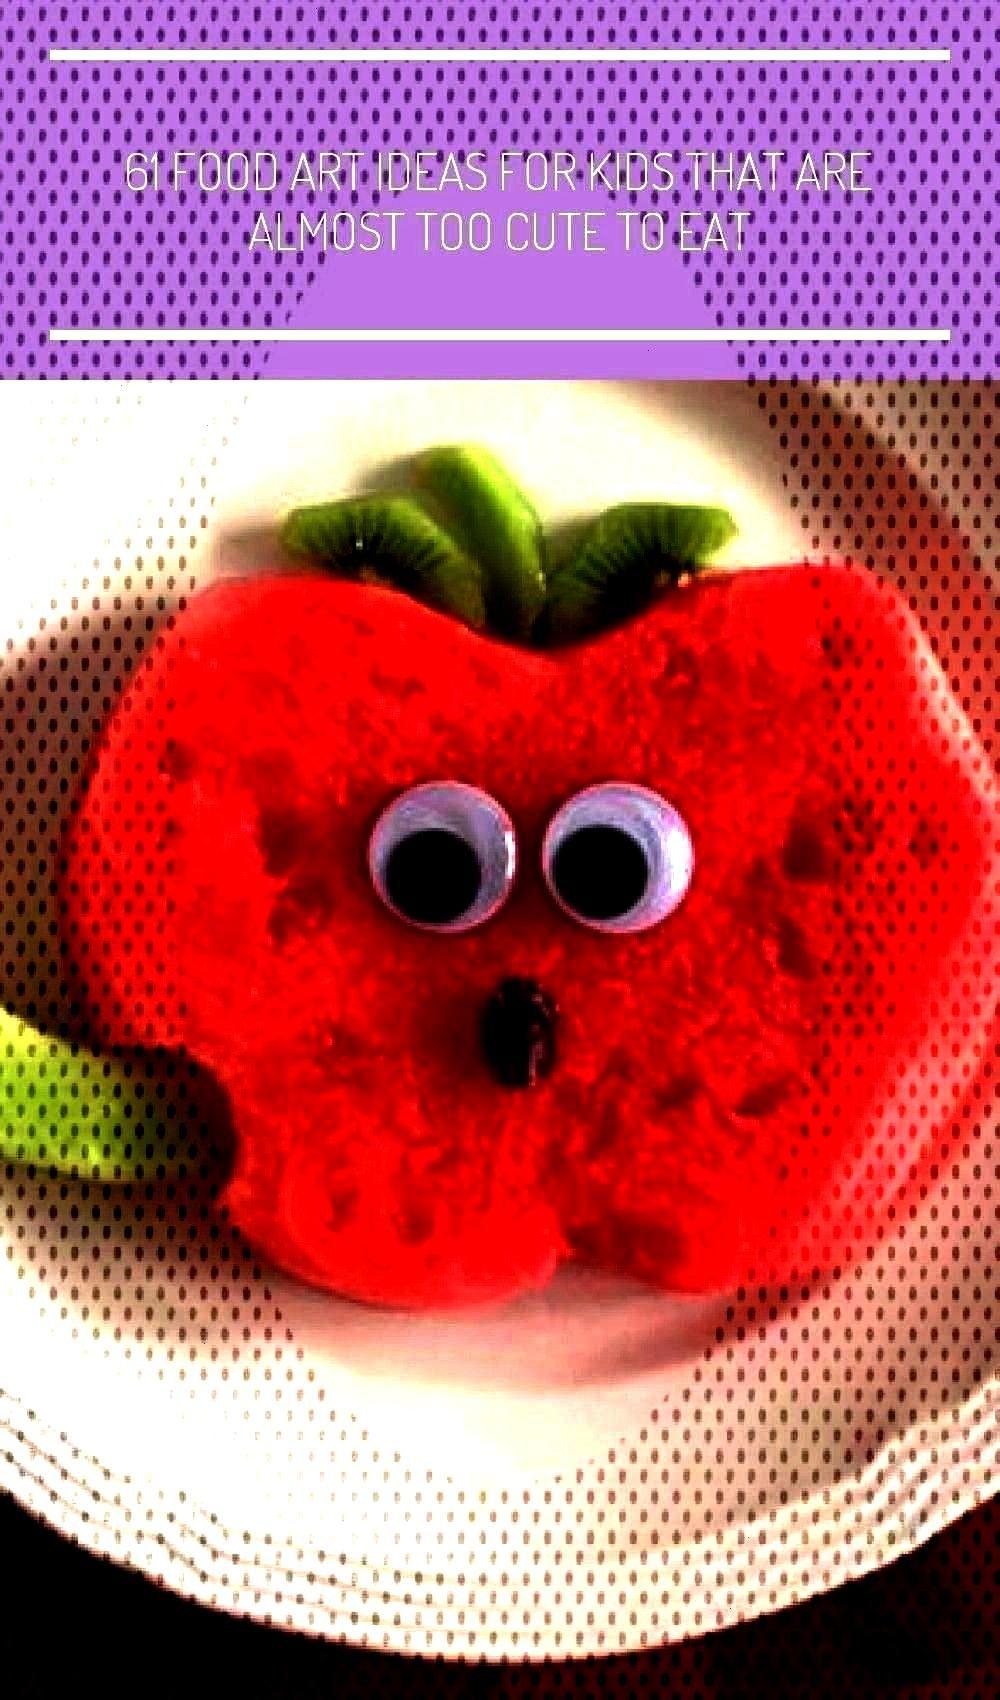 Food Art Lunches - Wassermelonen-Apfelsnack - art for kids50+ Kids Food Art Lunches - Wassermelonen